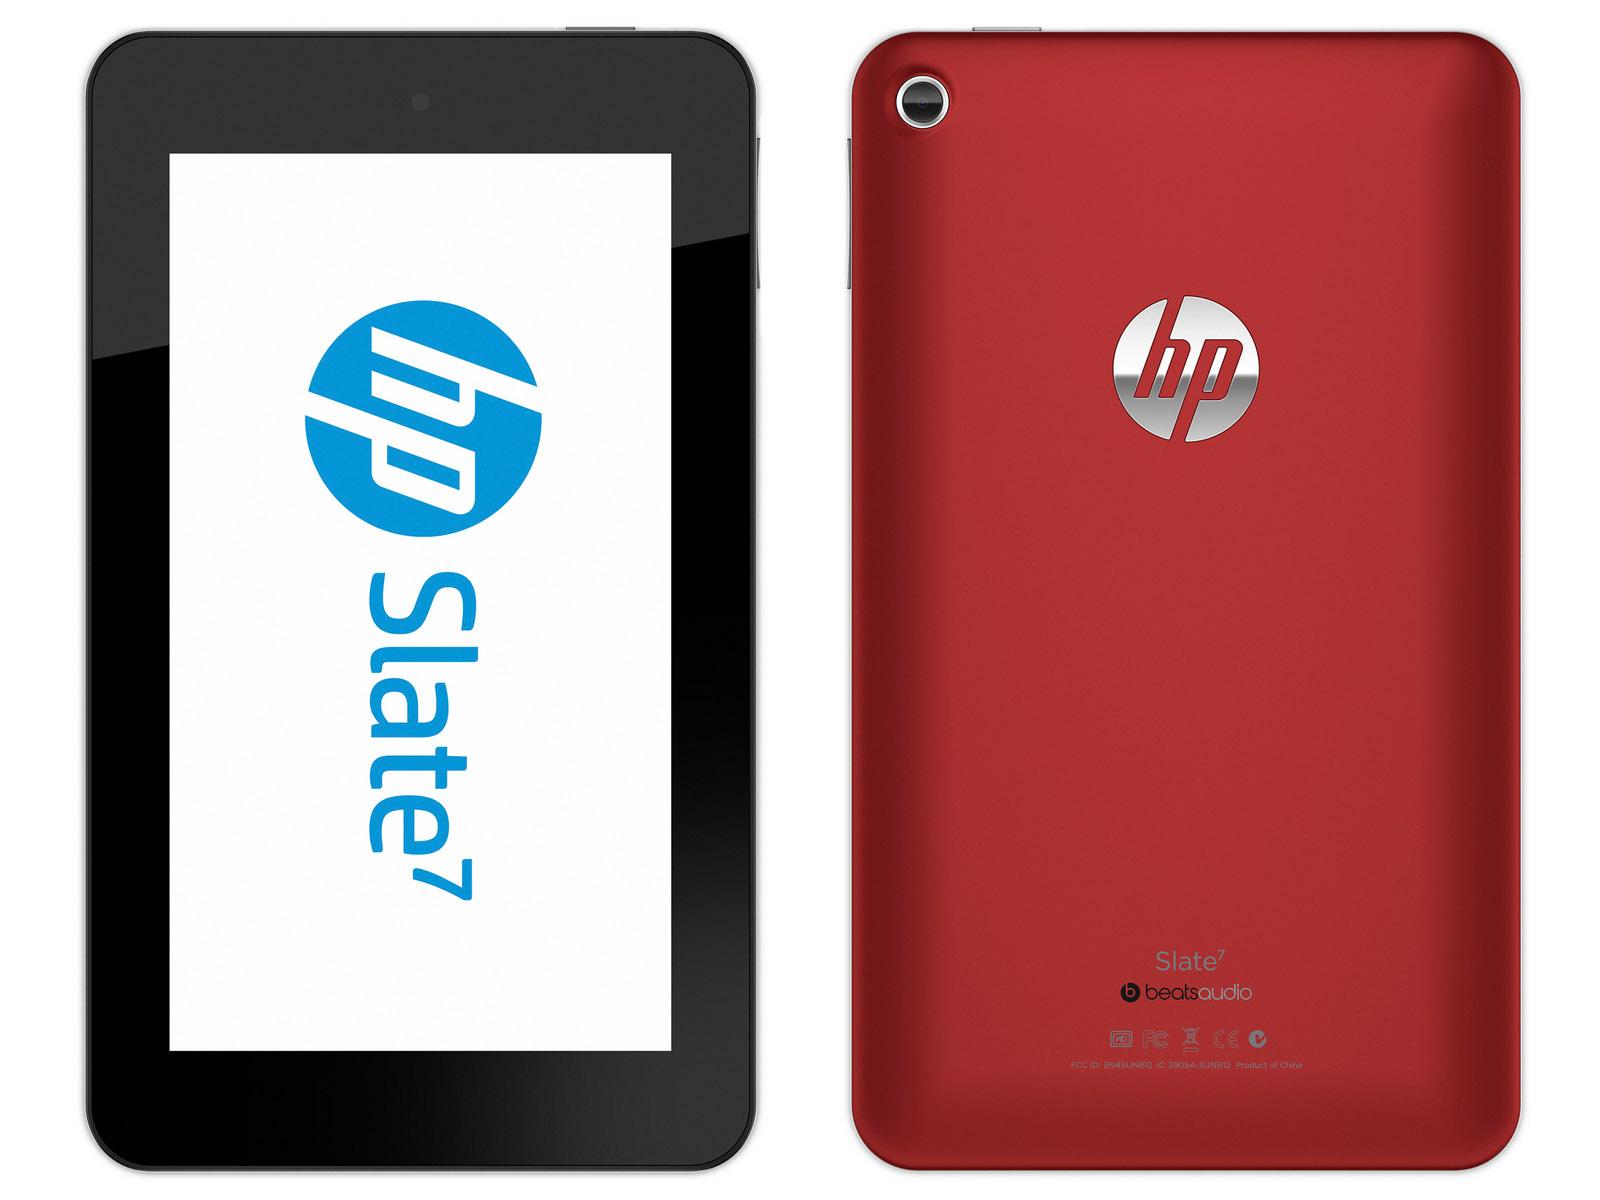 Slate 7 Tablet Android Jelly Bean Seharga 1,6 Jutaan, Persembahan HP